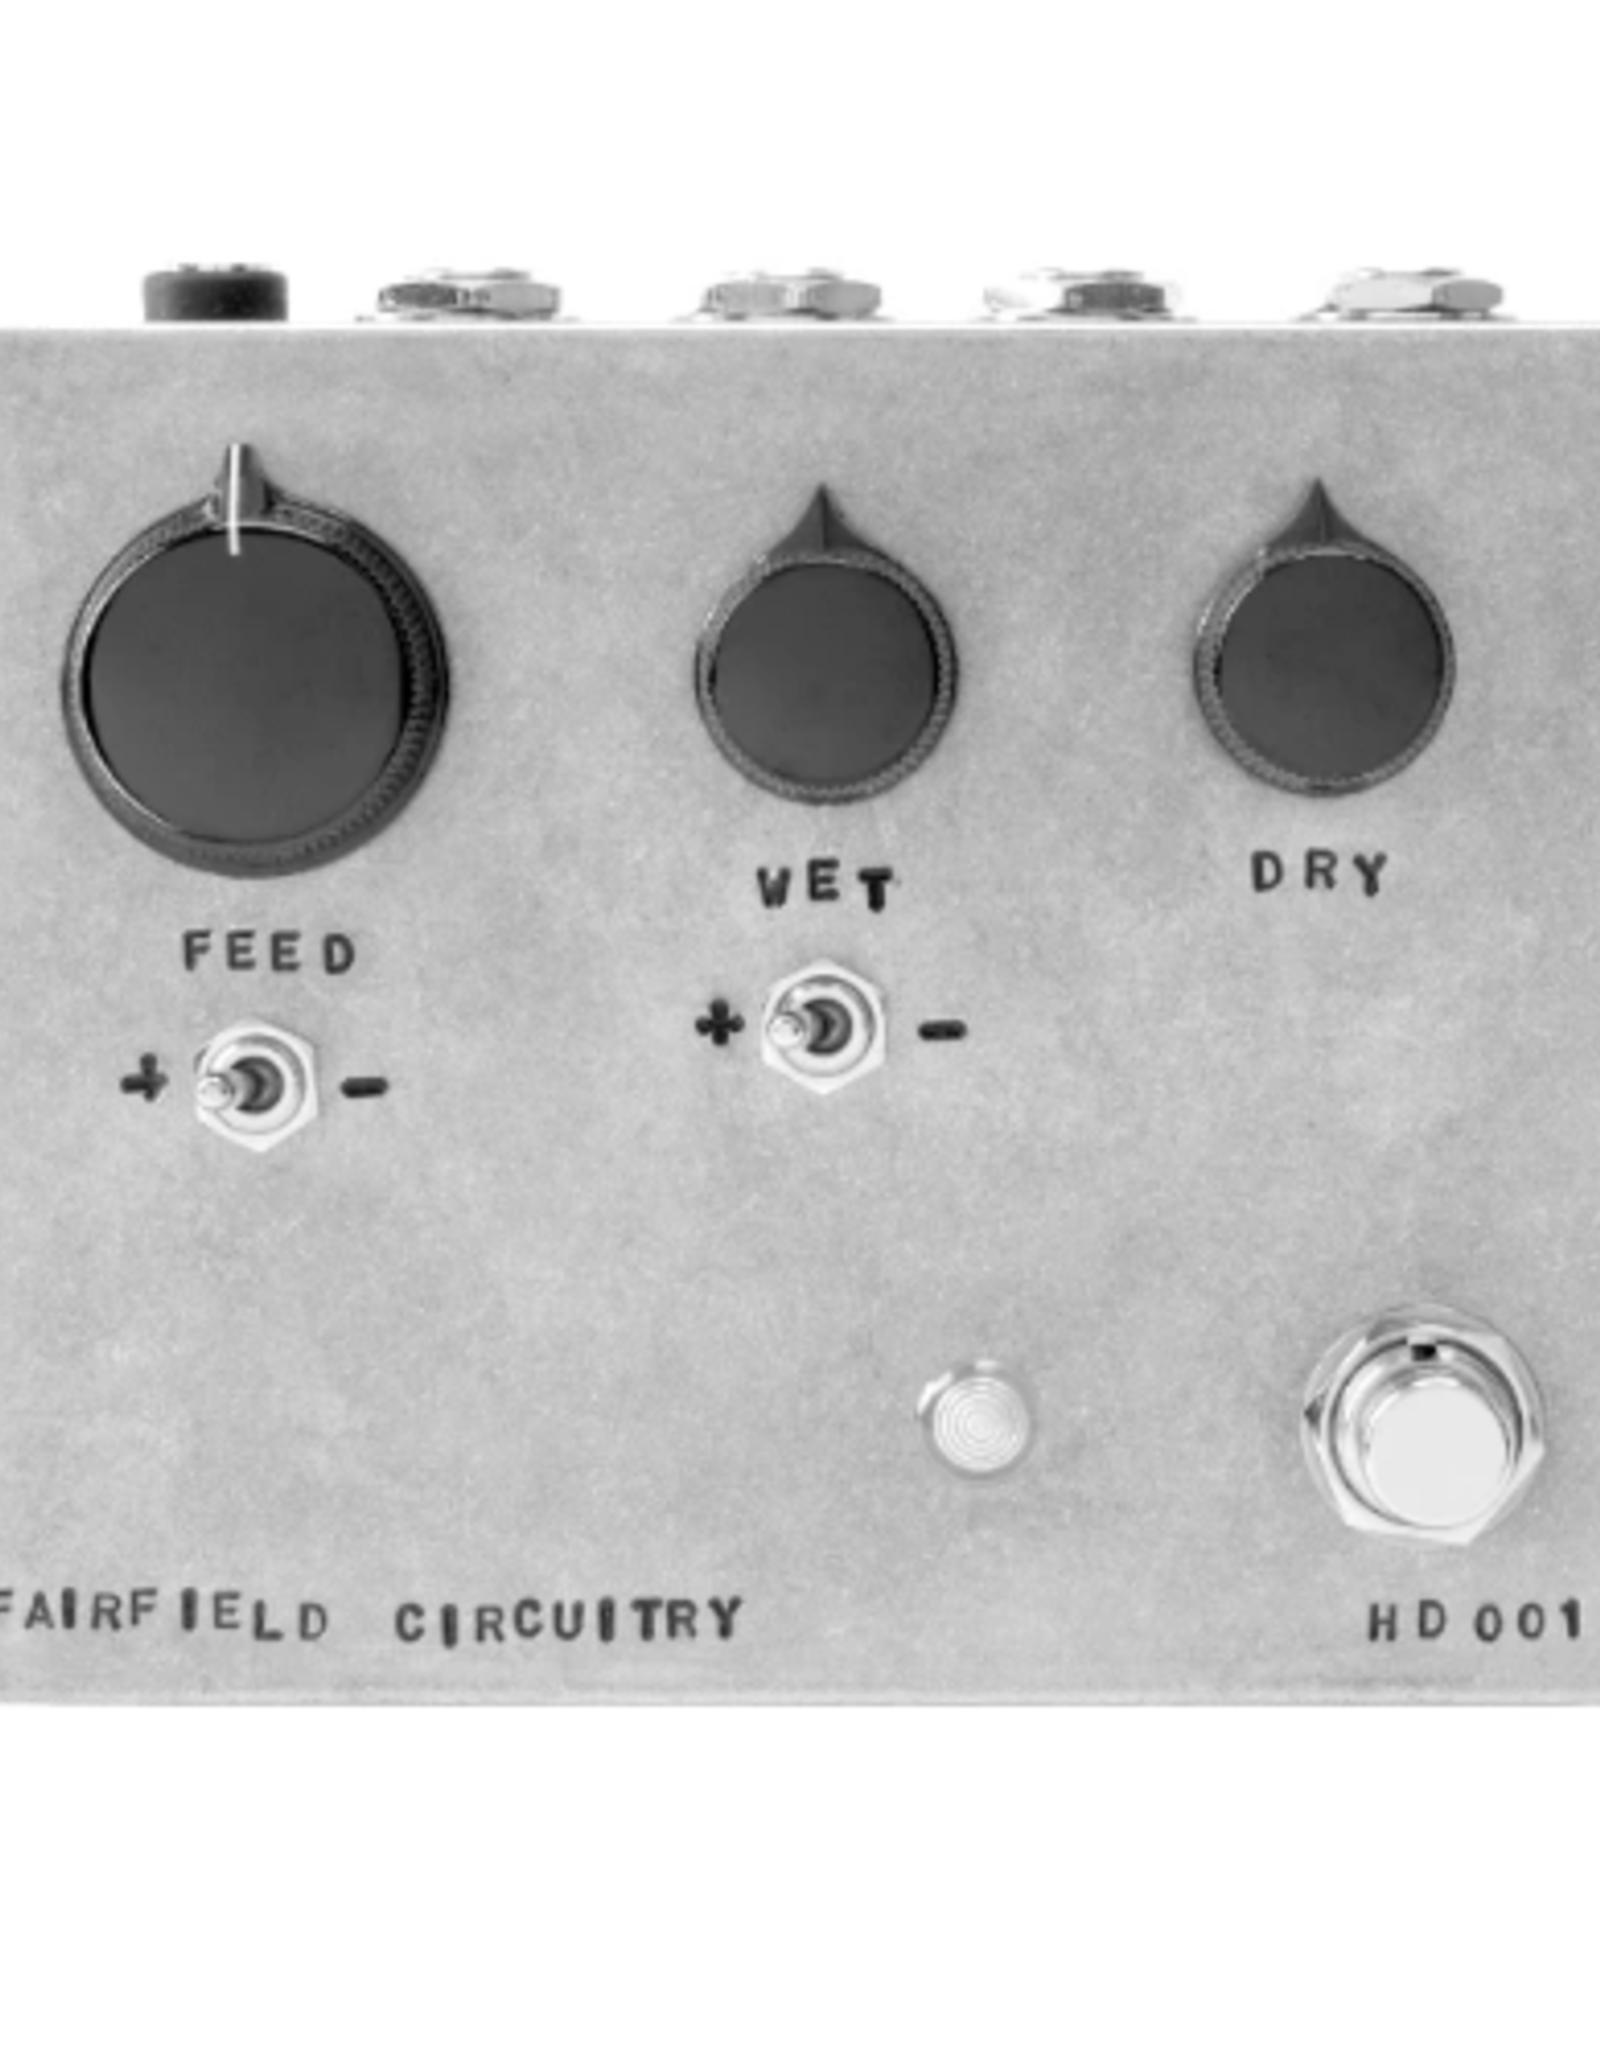 Fairfield Circuitry Fairfield Circuitry Hor D'oeuvre?, Active Feedback Loop